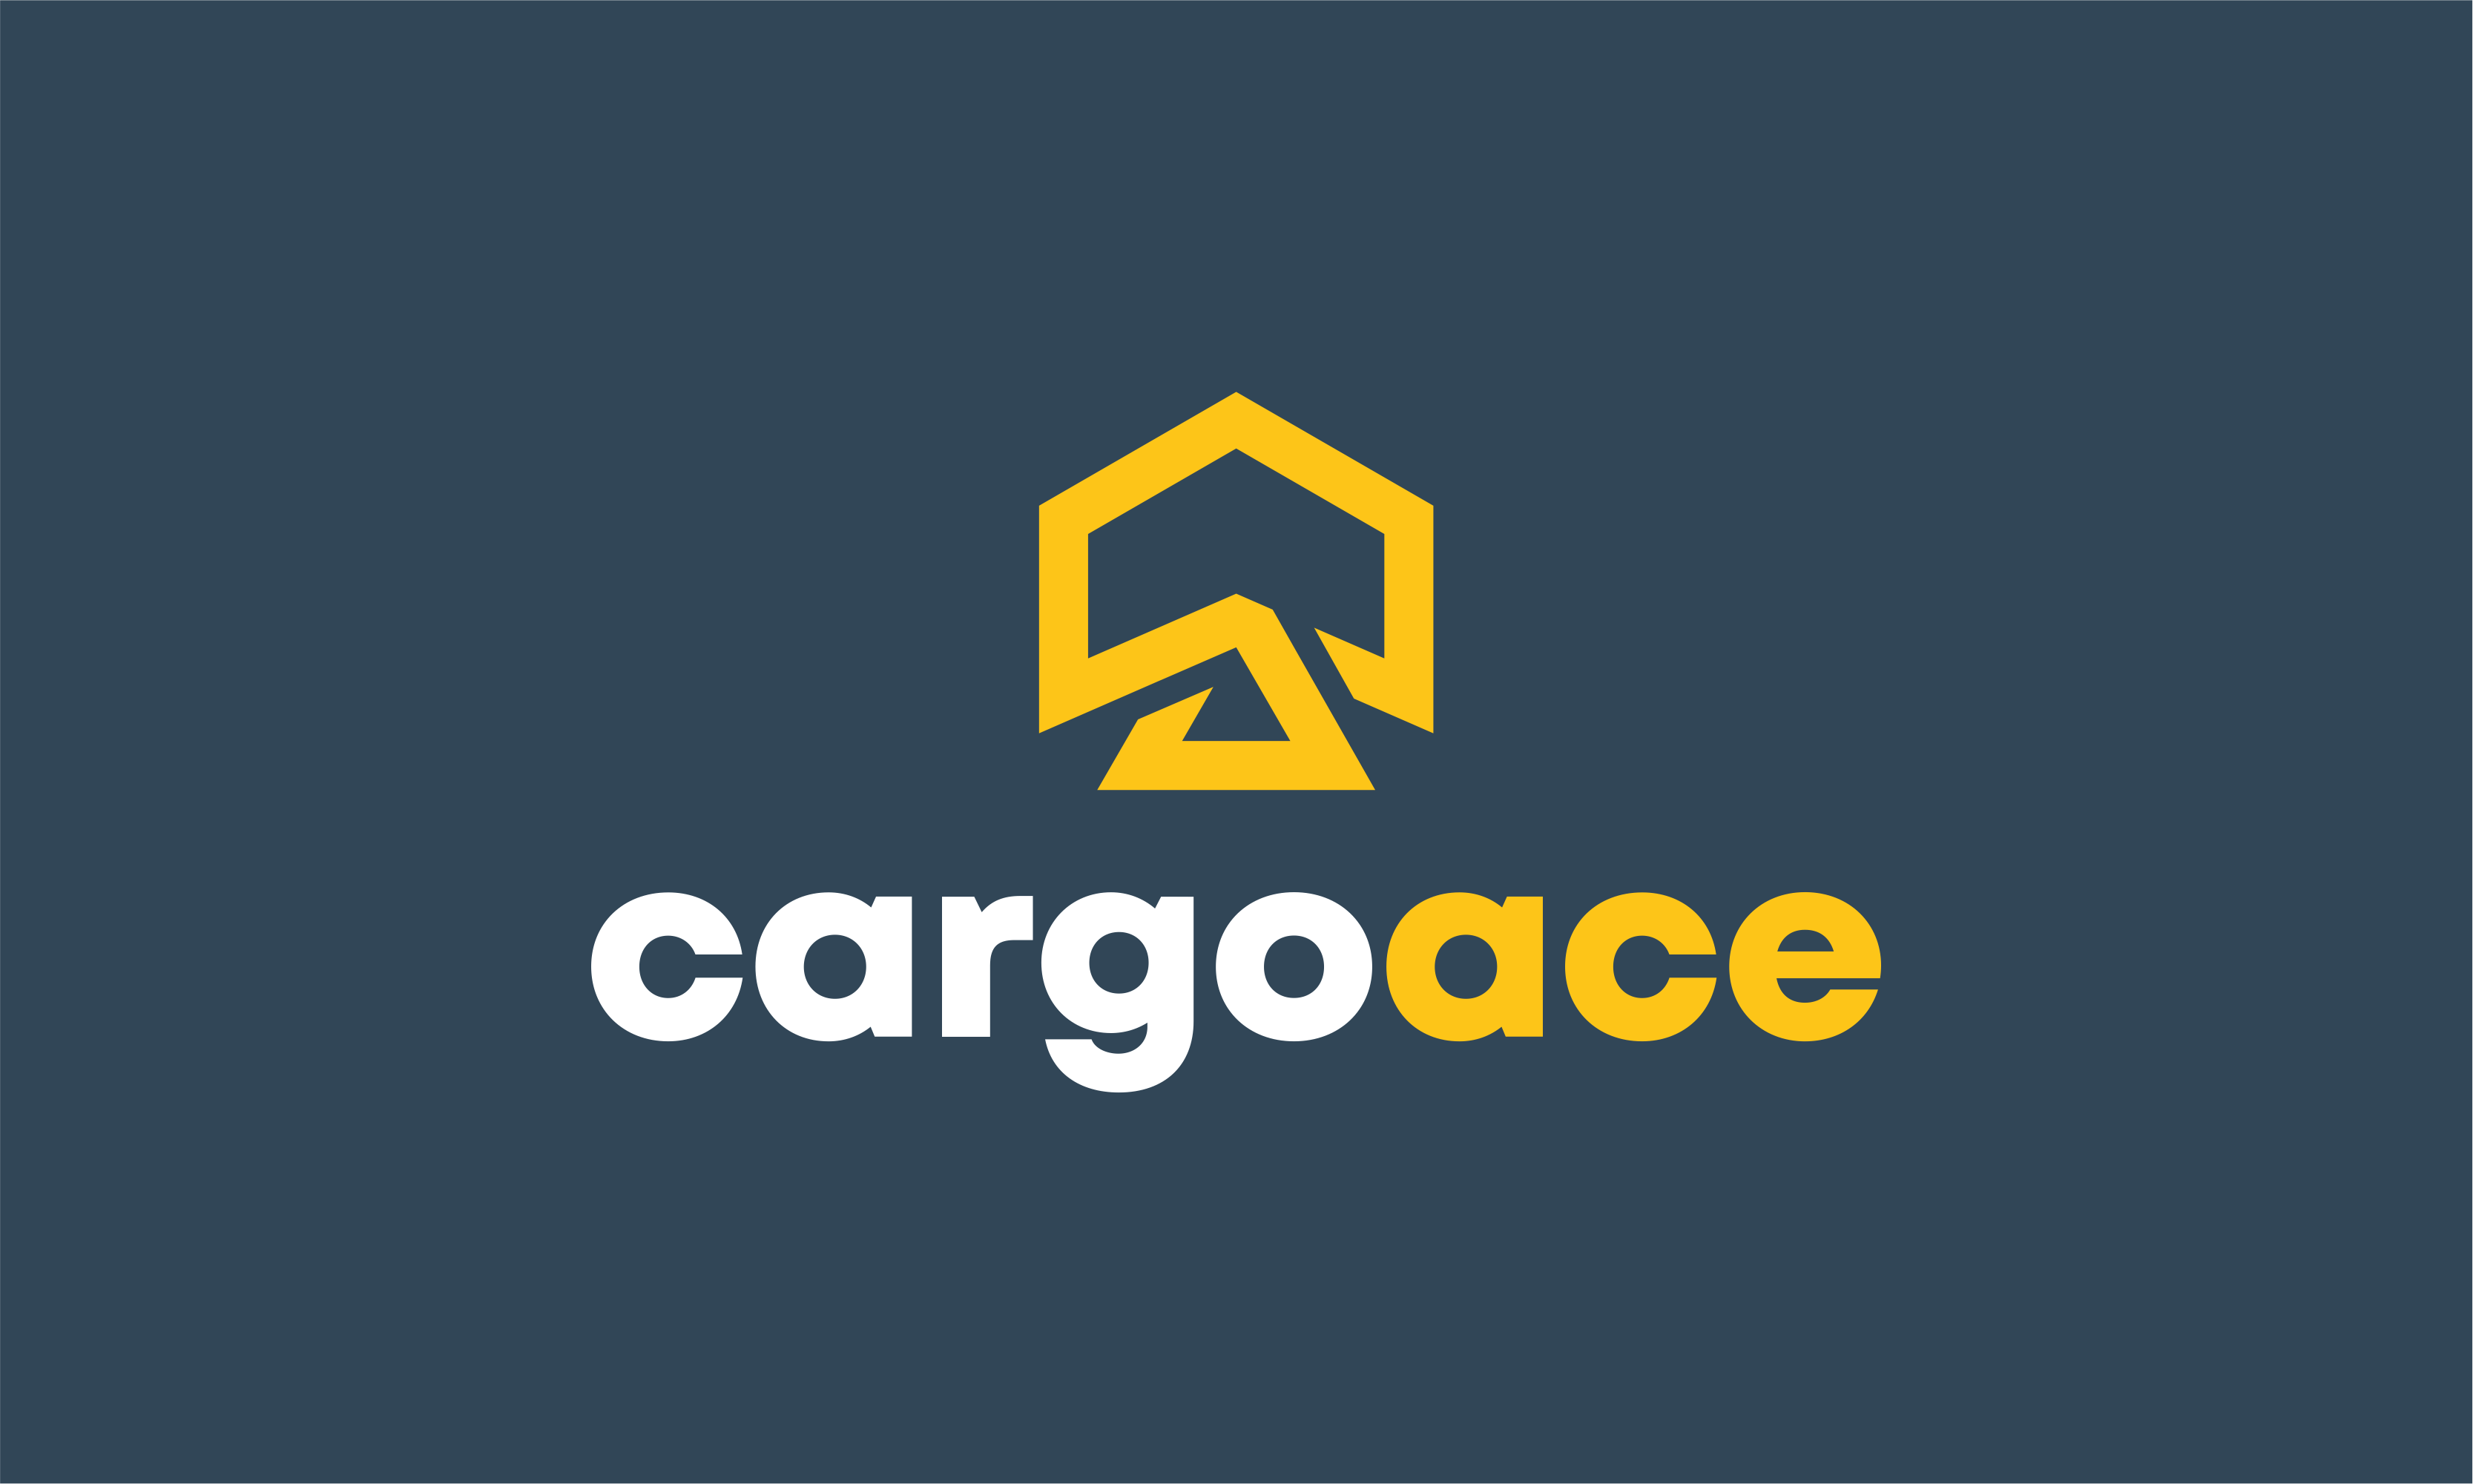 Cargoace